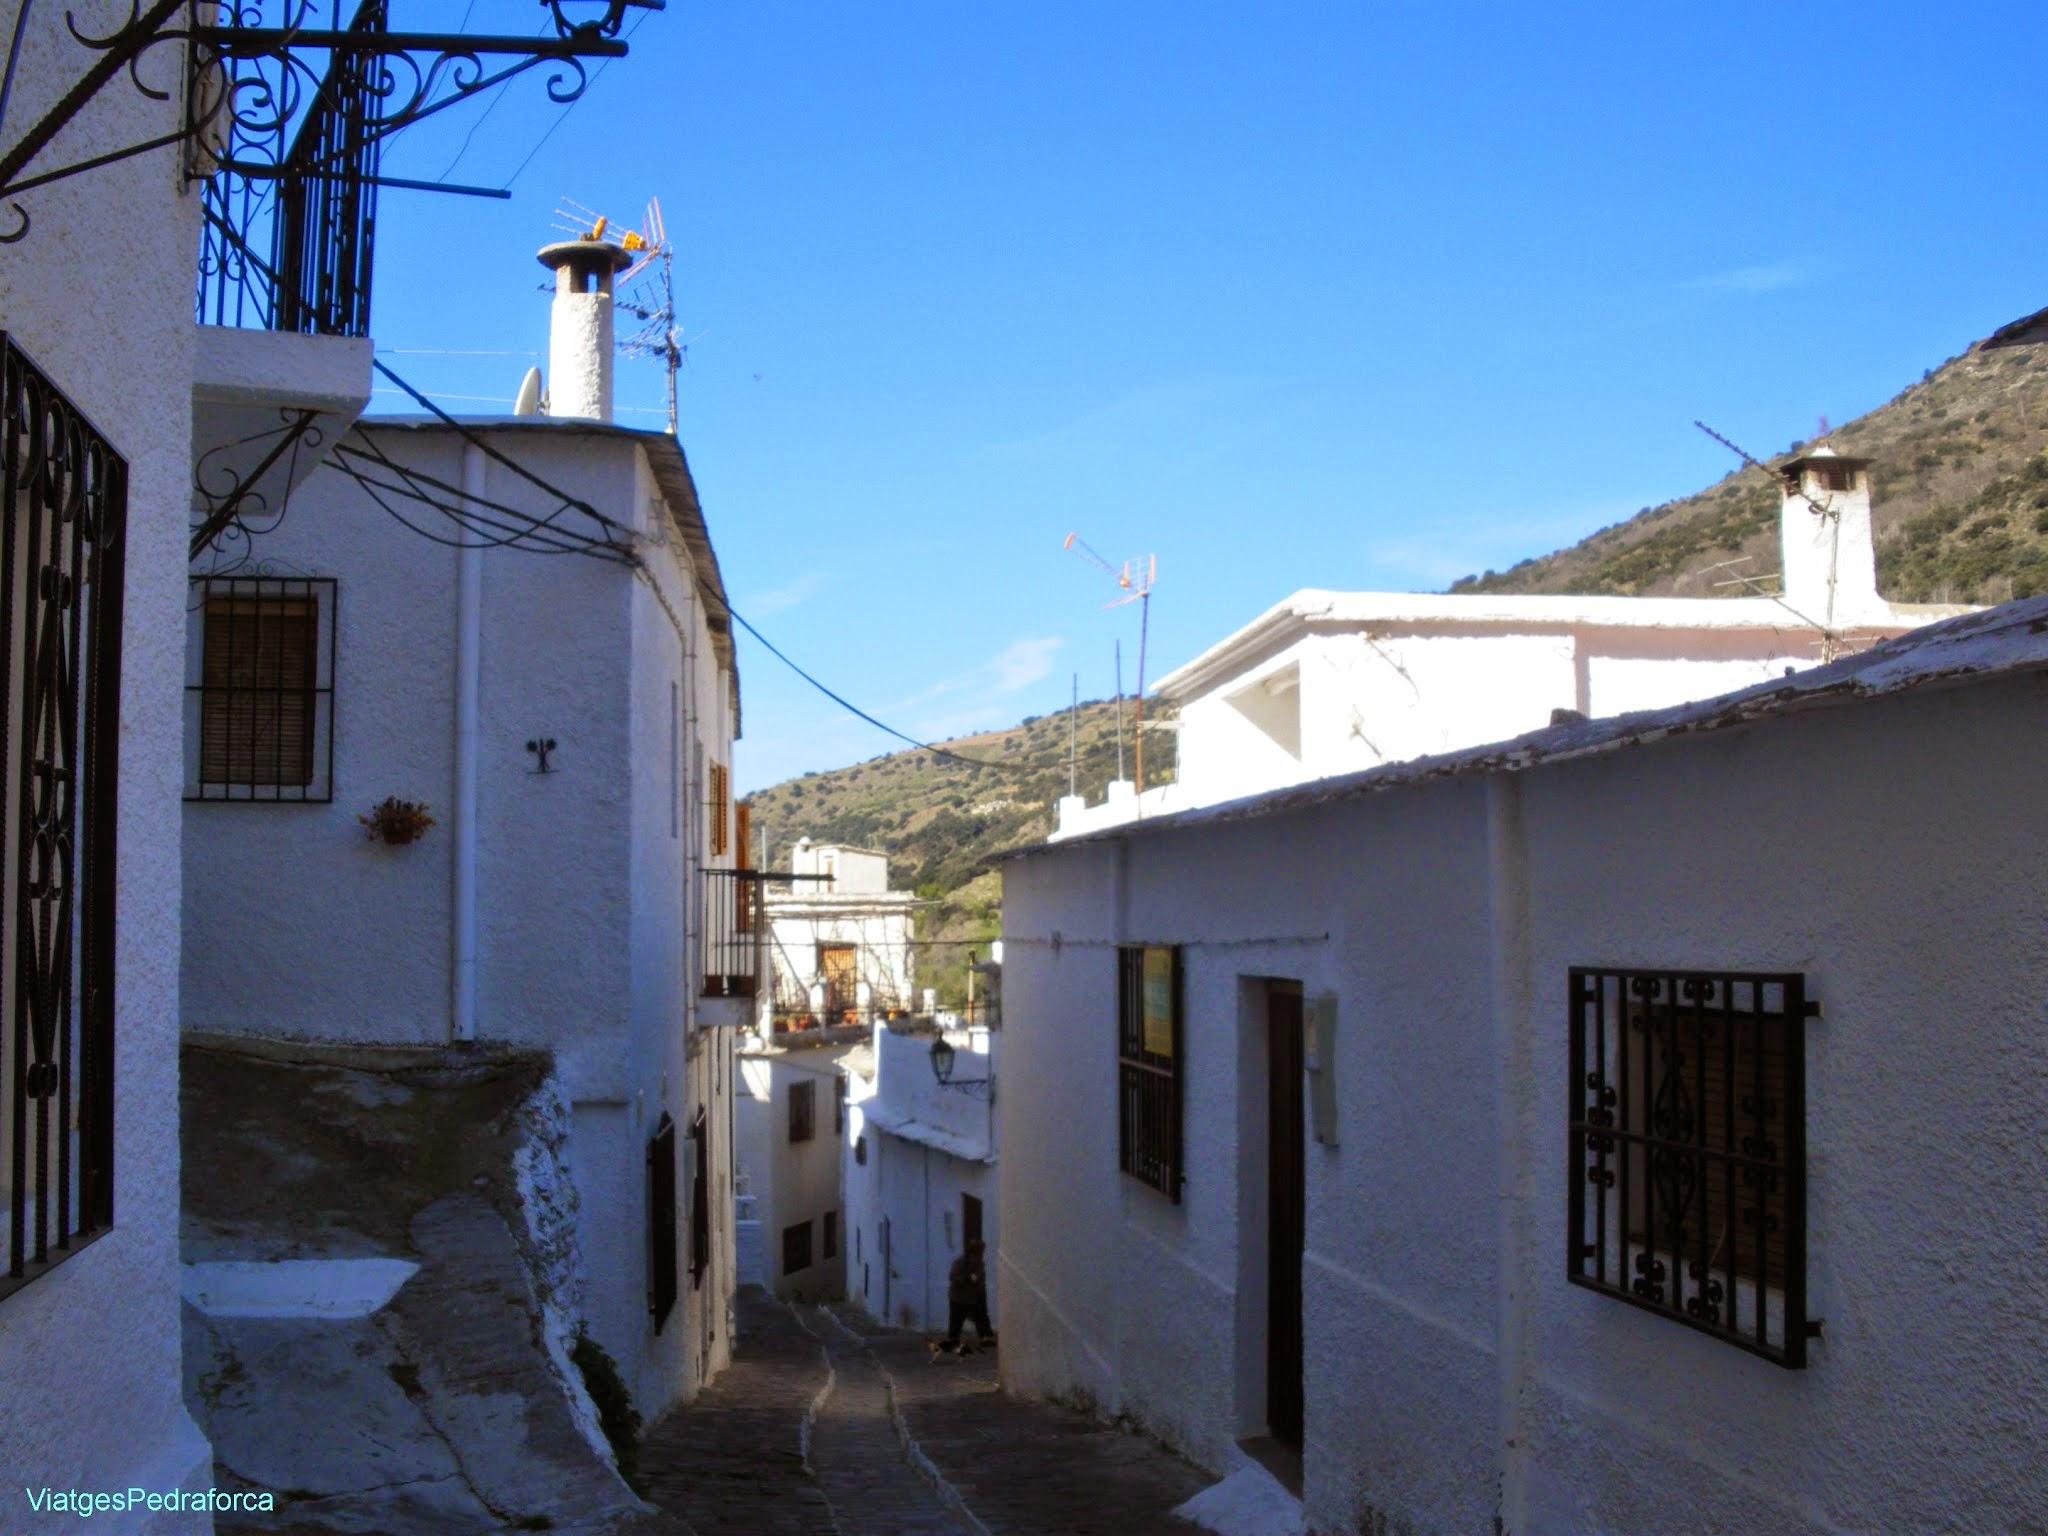 Pampaneira Alpujarra Granadina Barranco del Poqueira Sierra Nevada Andalucia